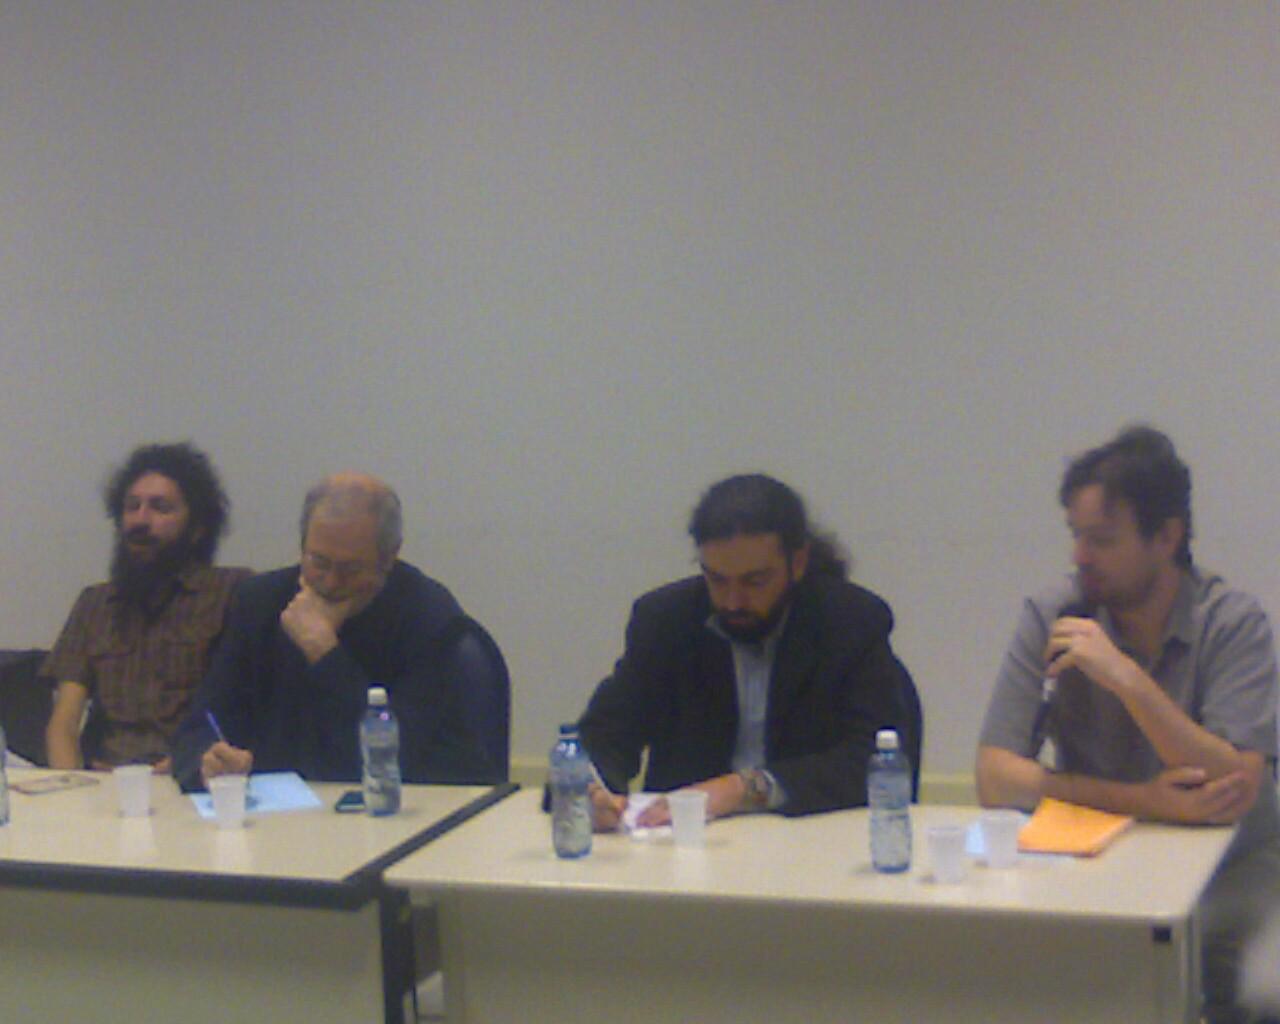 Debate com @PradoClaudio e @alfredomanevy no @ufsctock